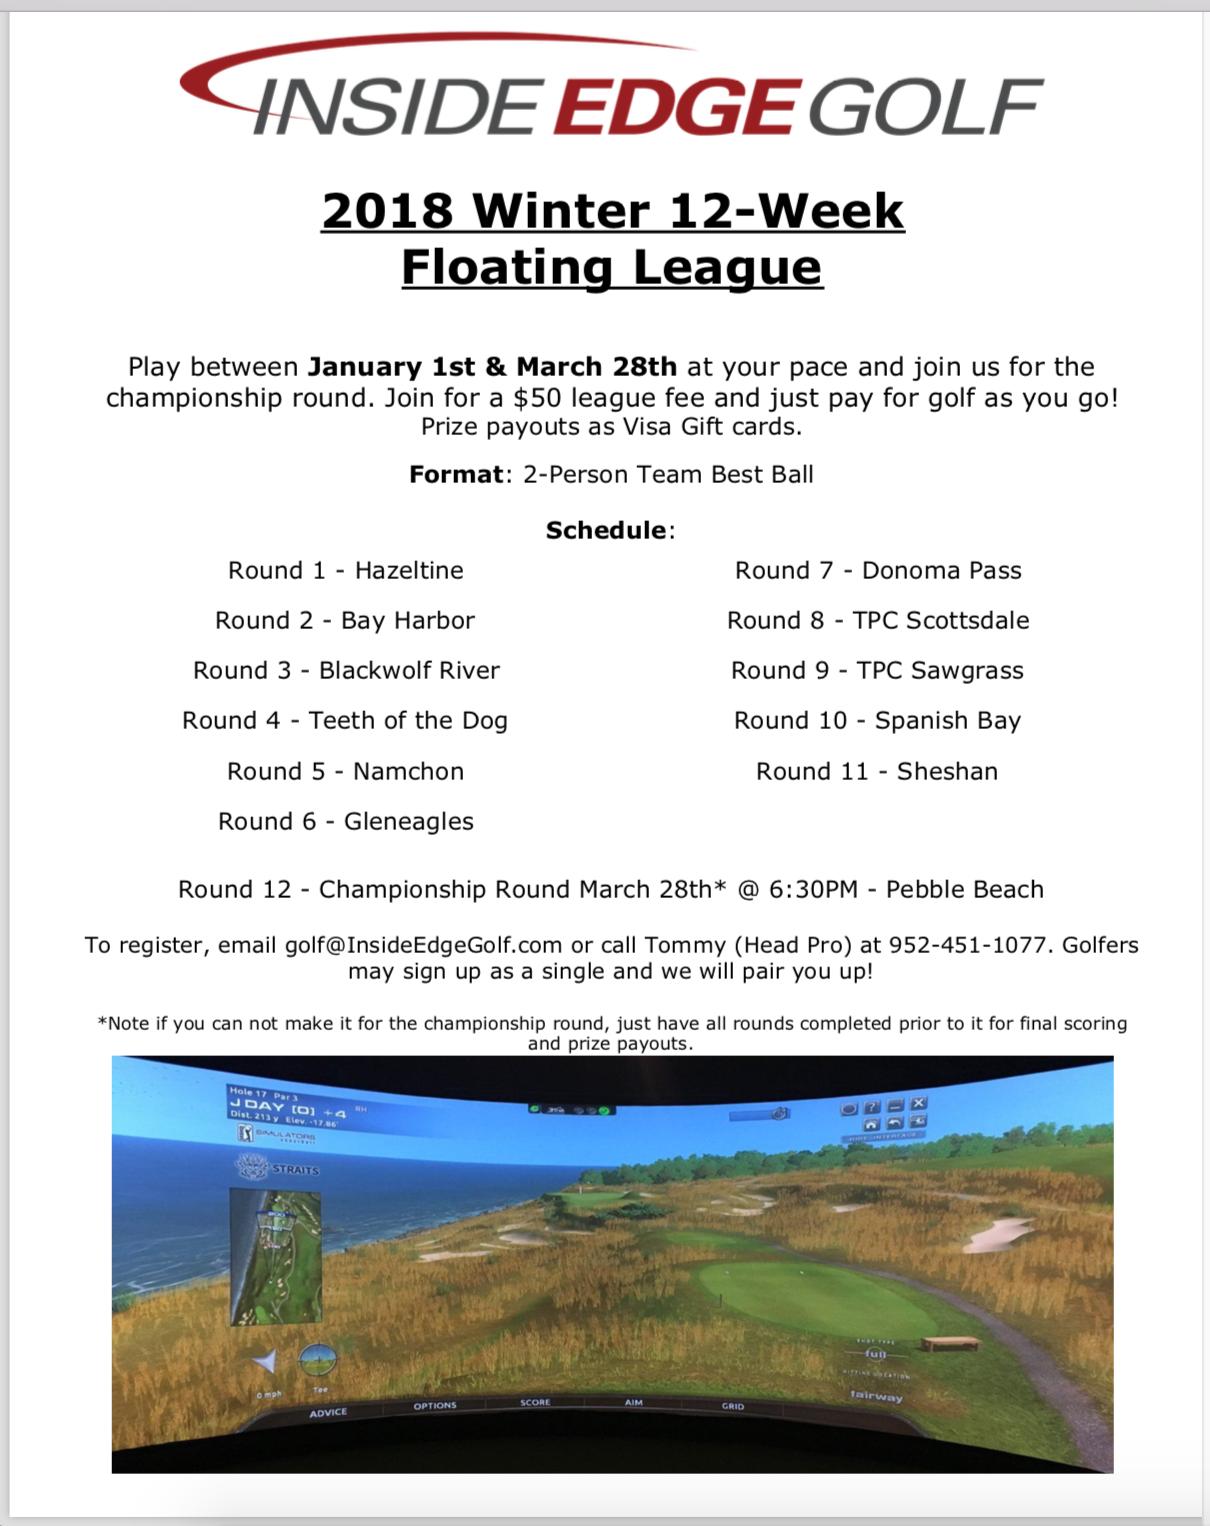 Inside Edge Golf Simulator Winter (January thru March) 12